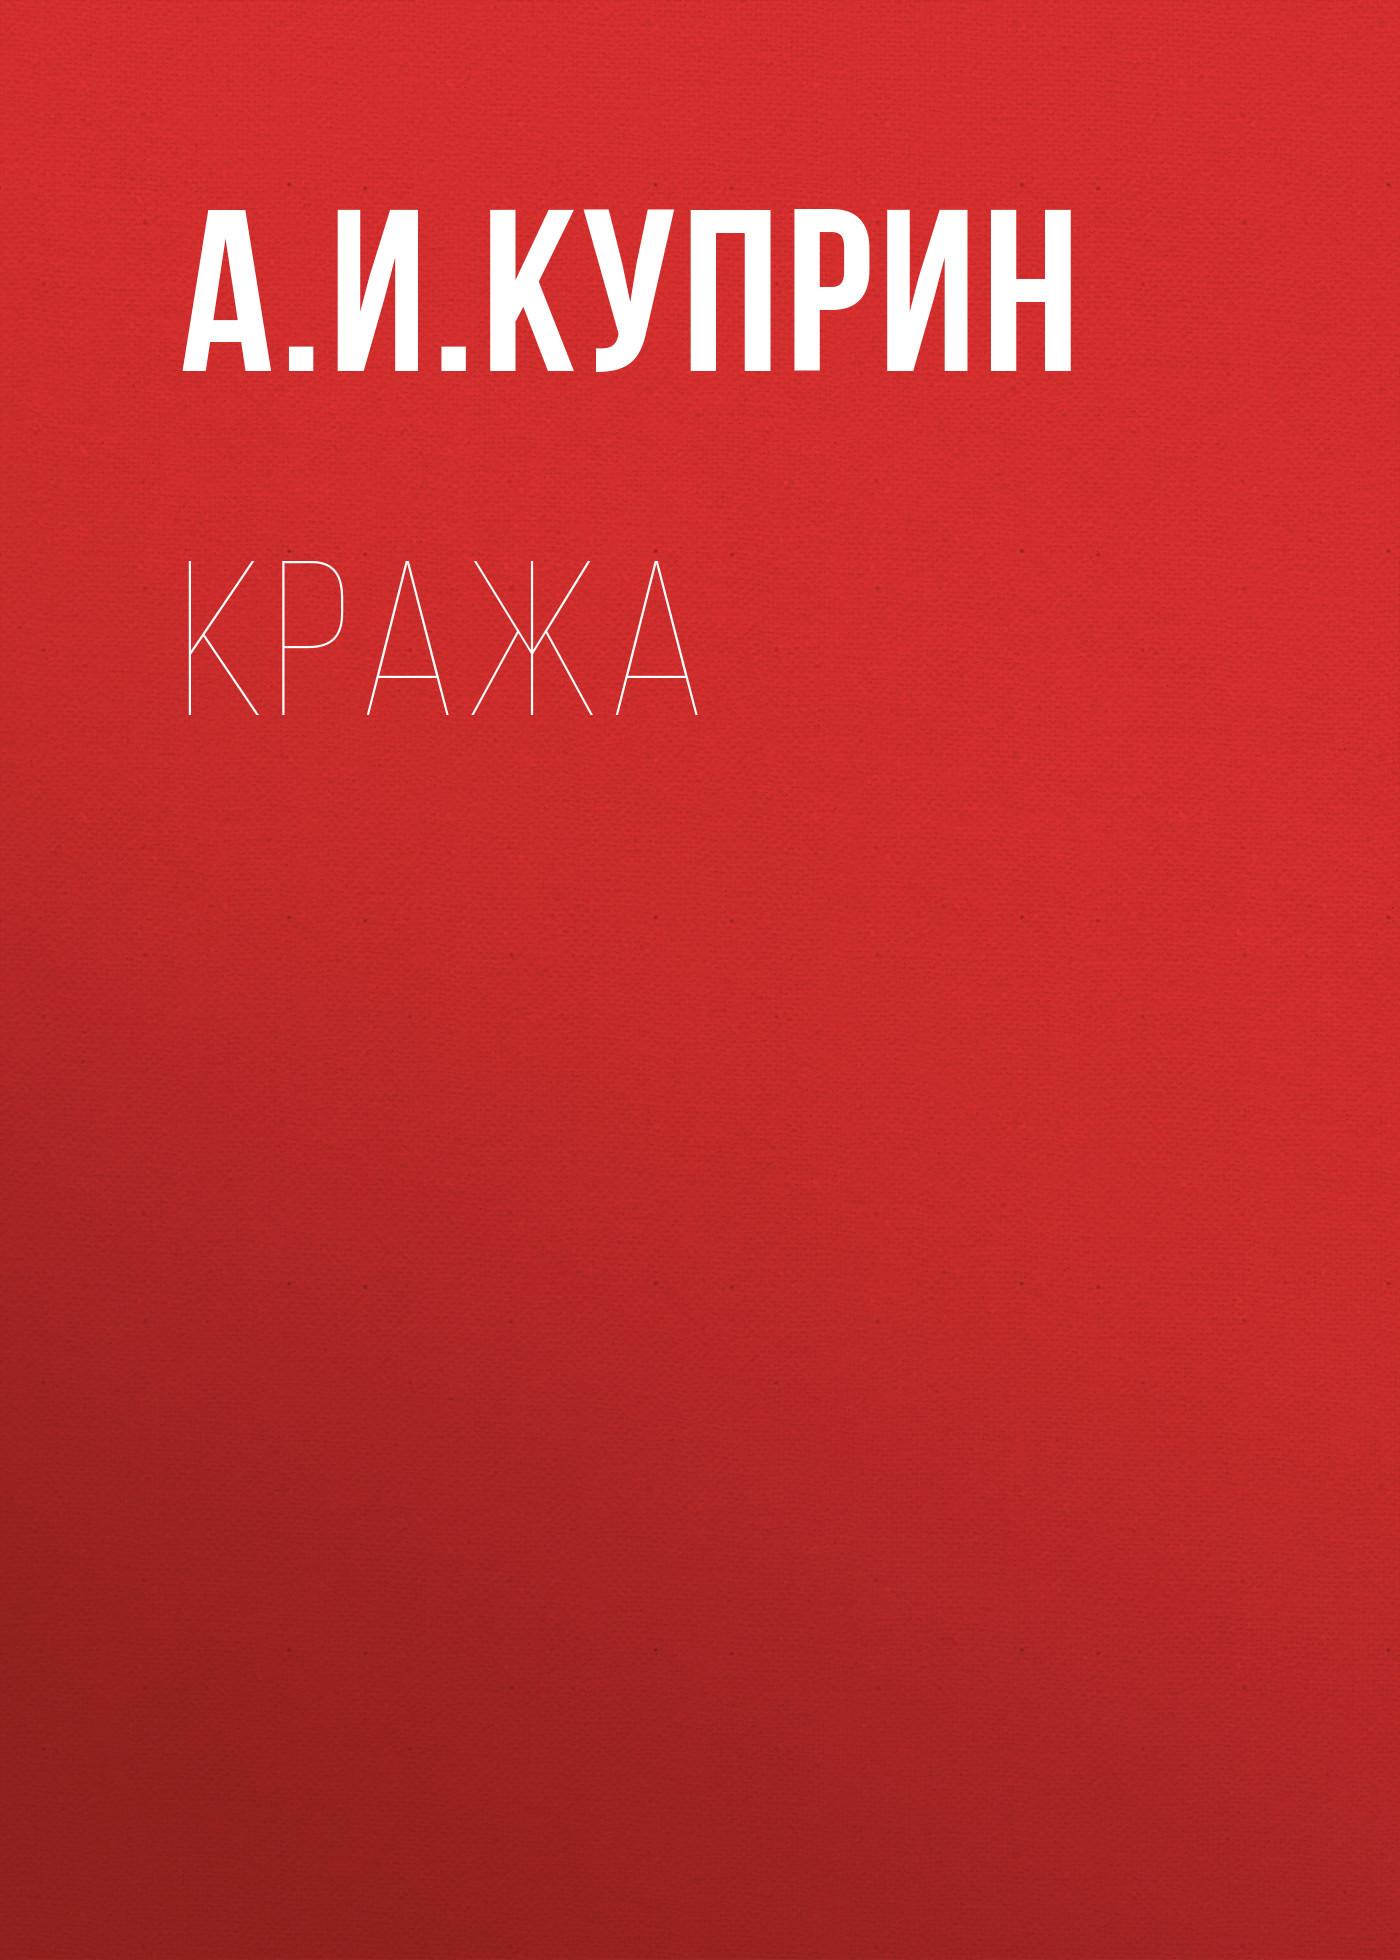 А. И. Куприн. Кража